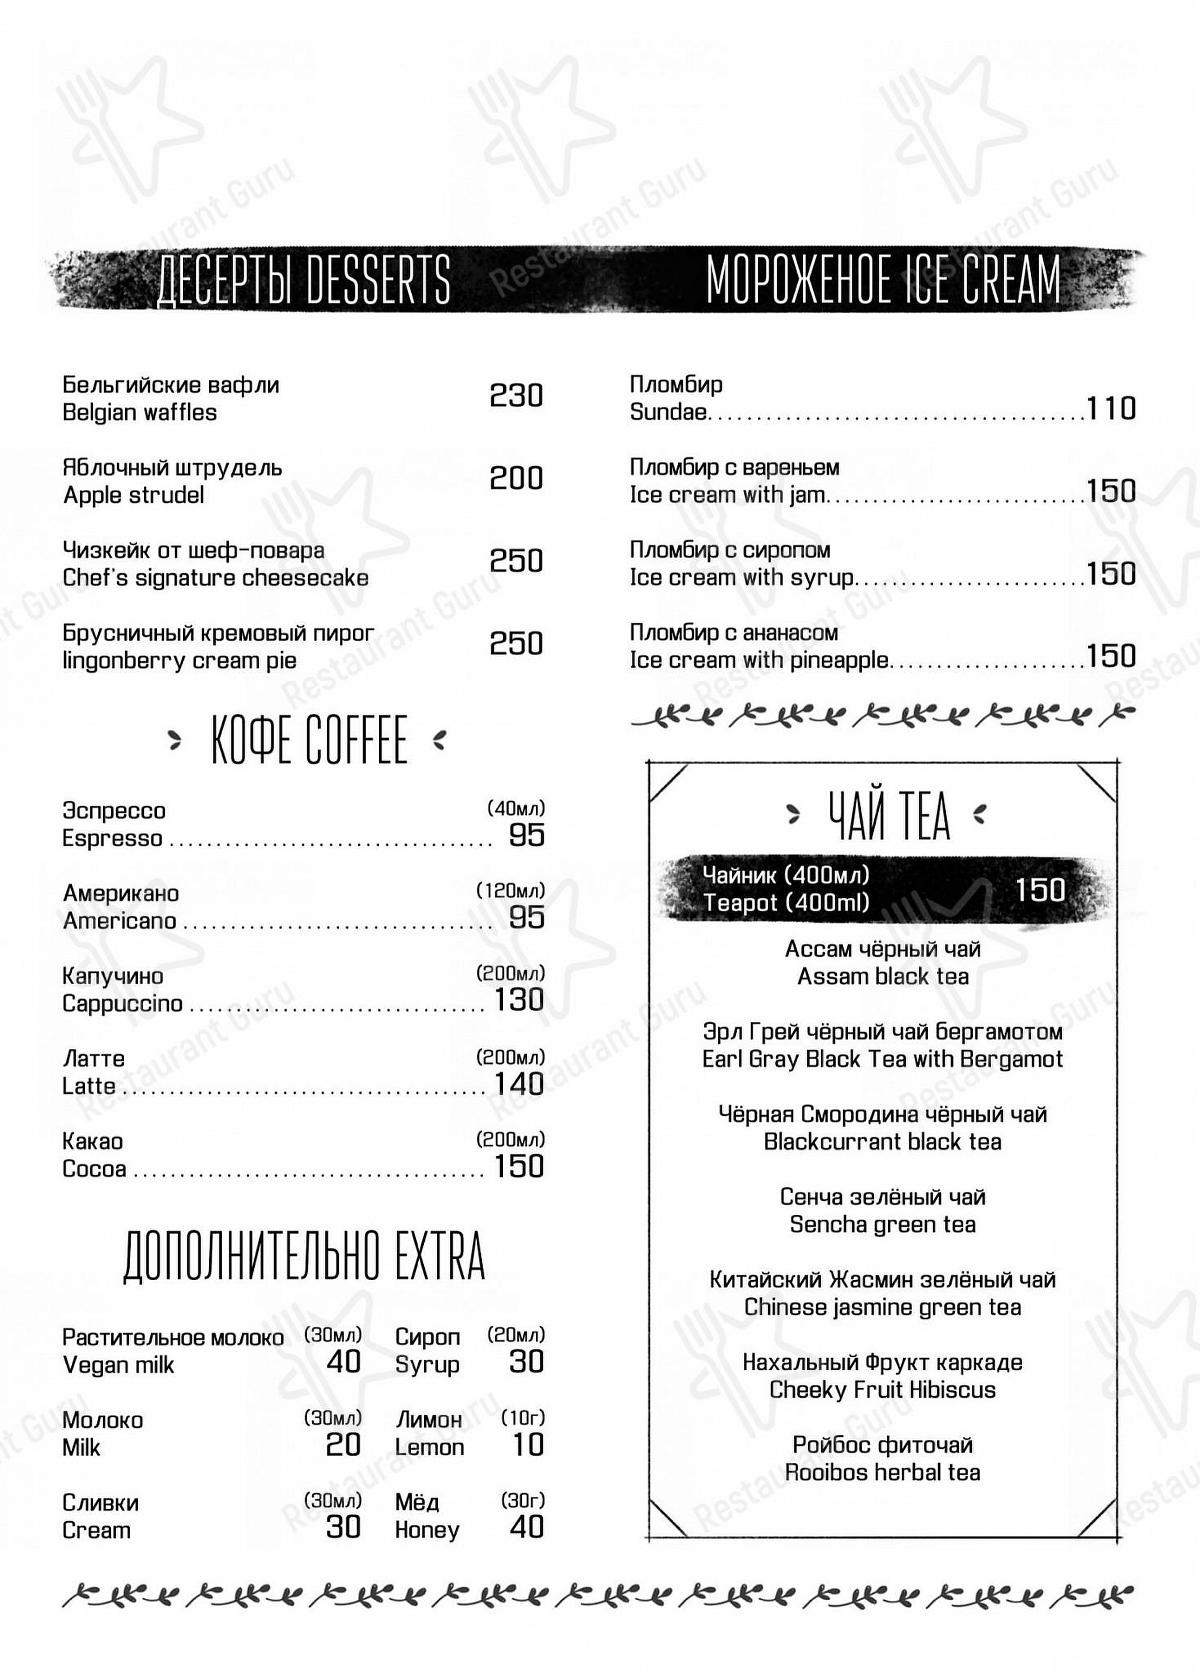 Заводные Яйца menu - dishes and beverages